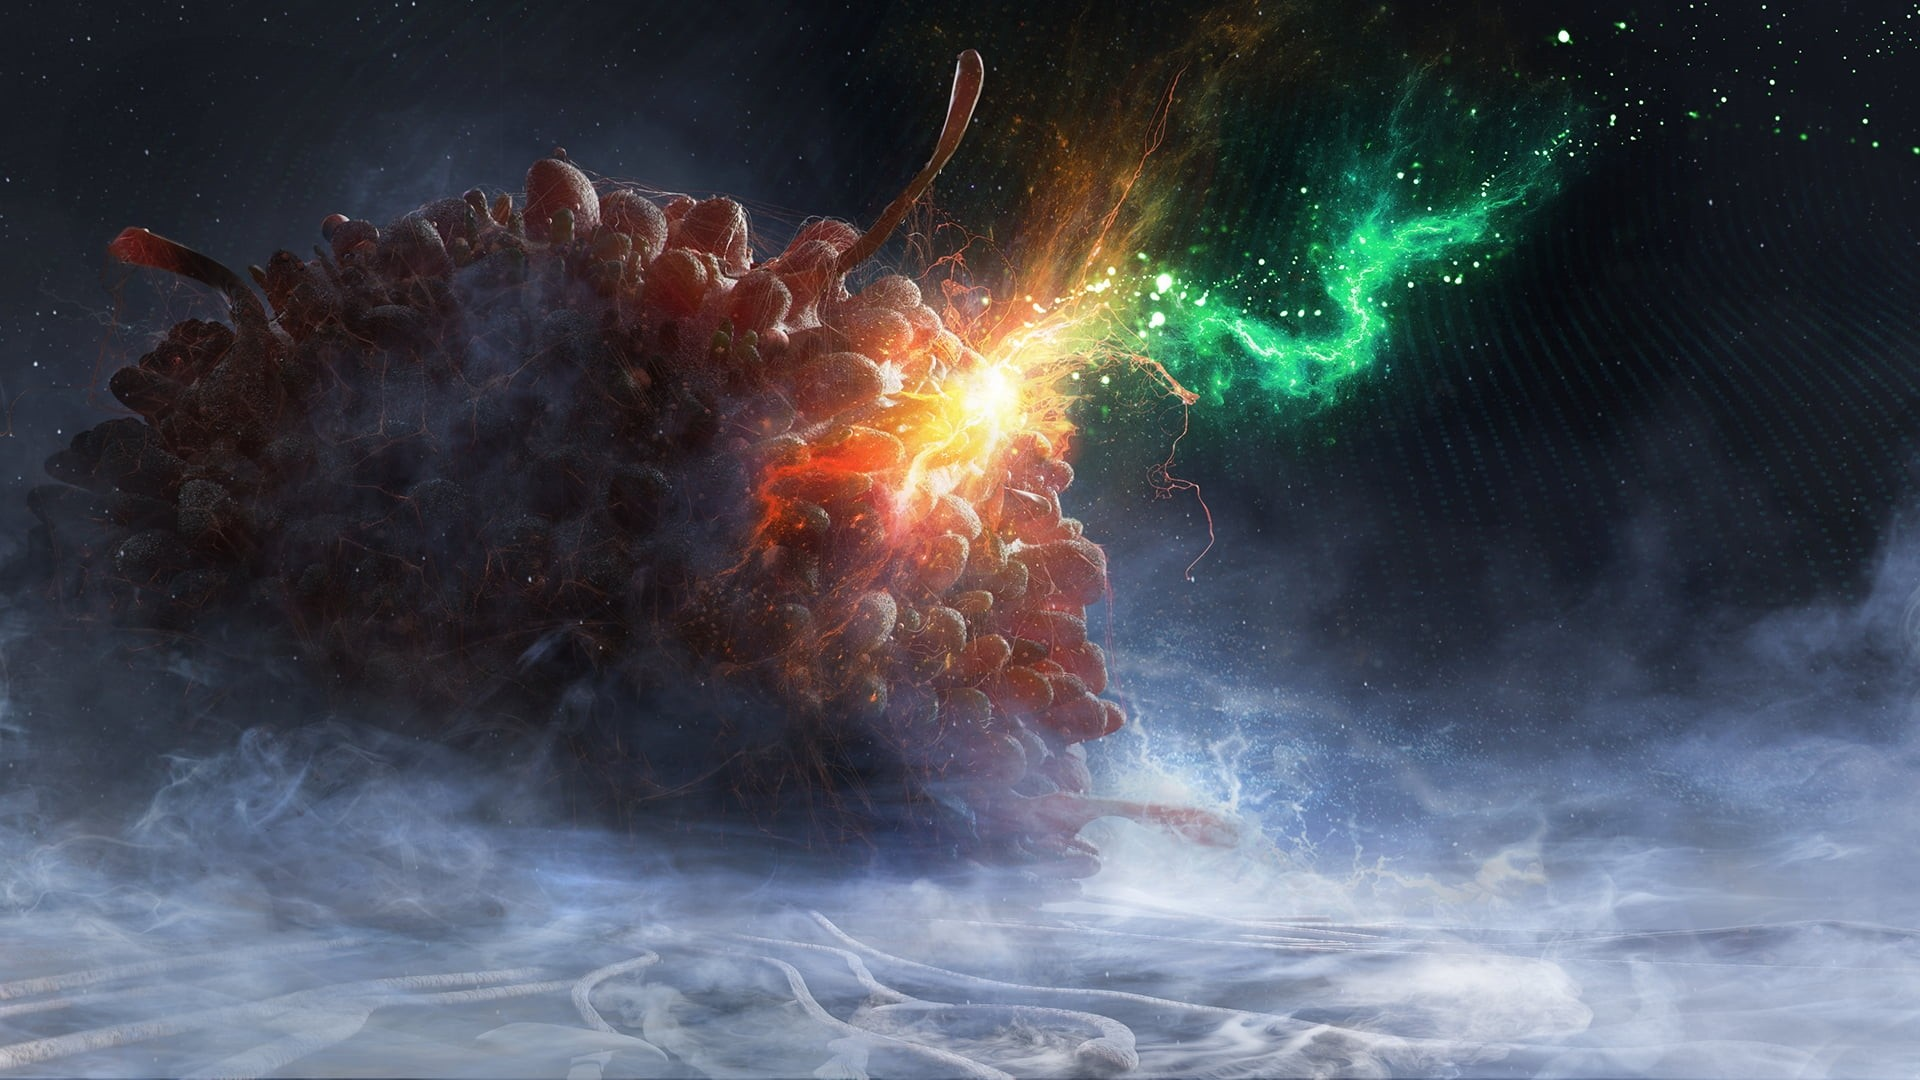 Explosion Image